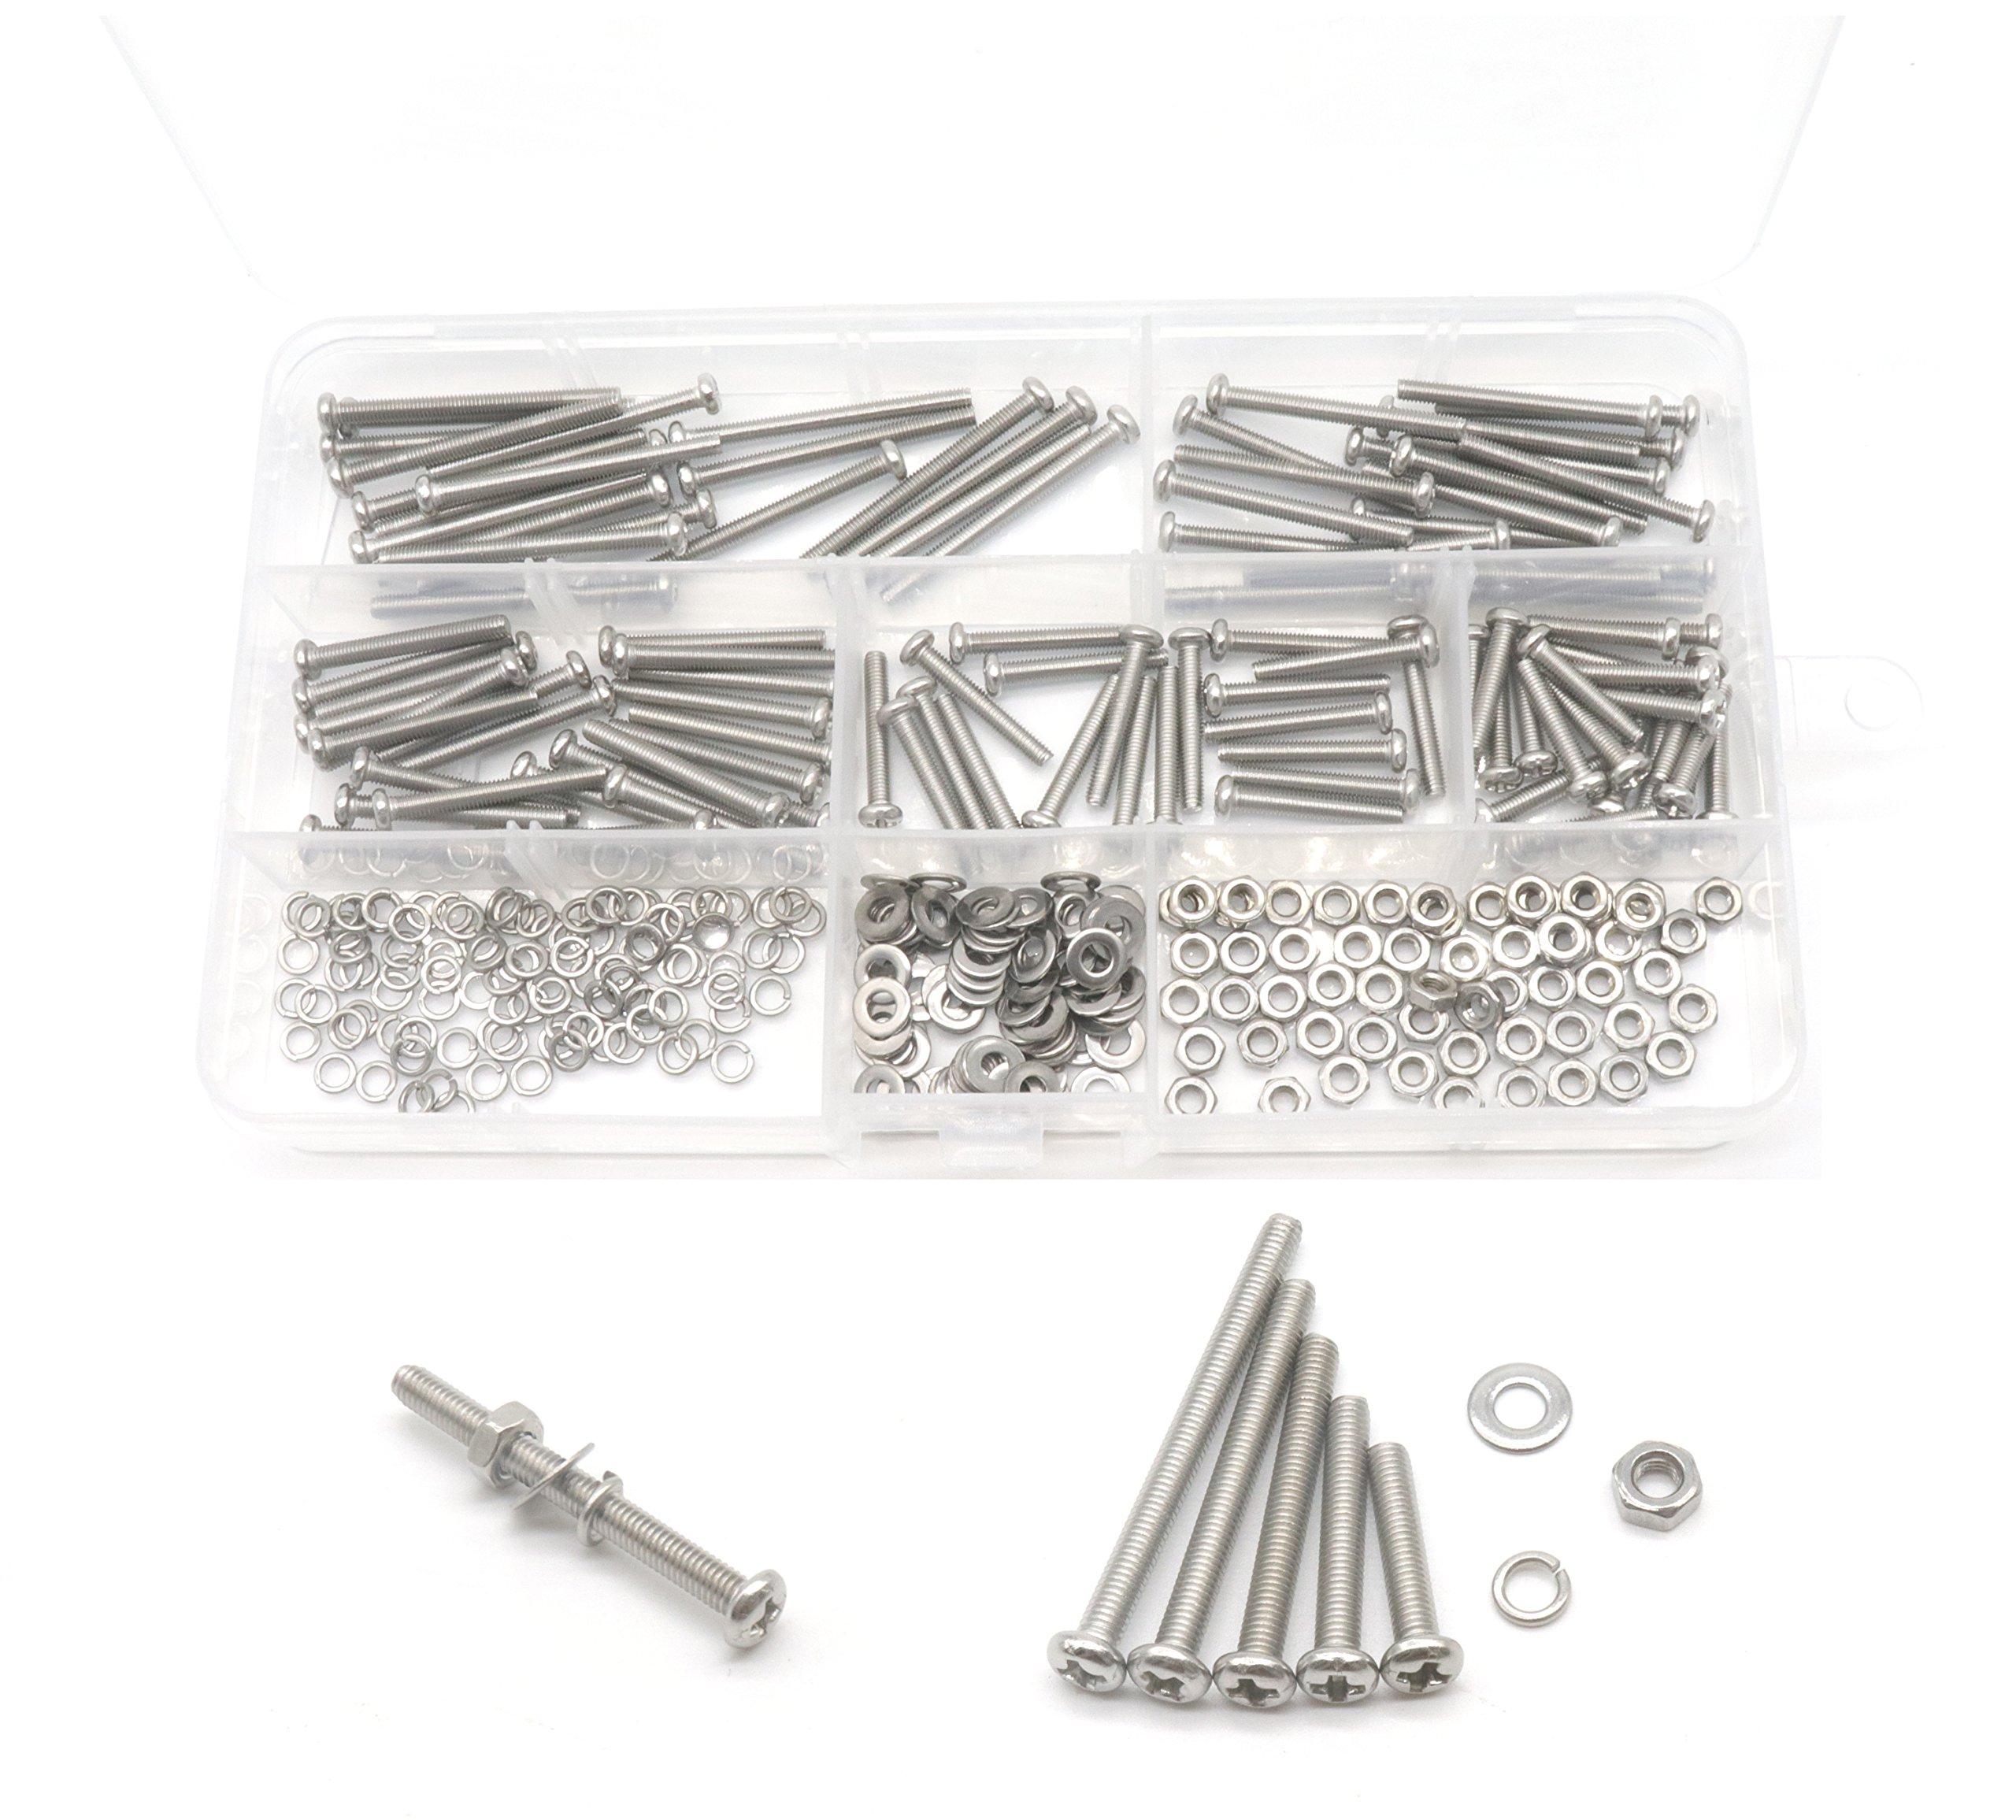 cSeao 340pcs Pan Phillips Head M3 Screws Nuts Washers Assortment Kit, M3x16mm/20mm/25mm/30mm/35mm, 304 Stainless Steel